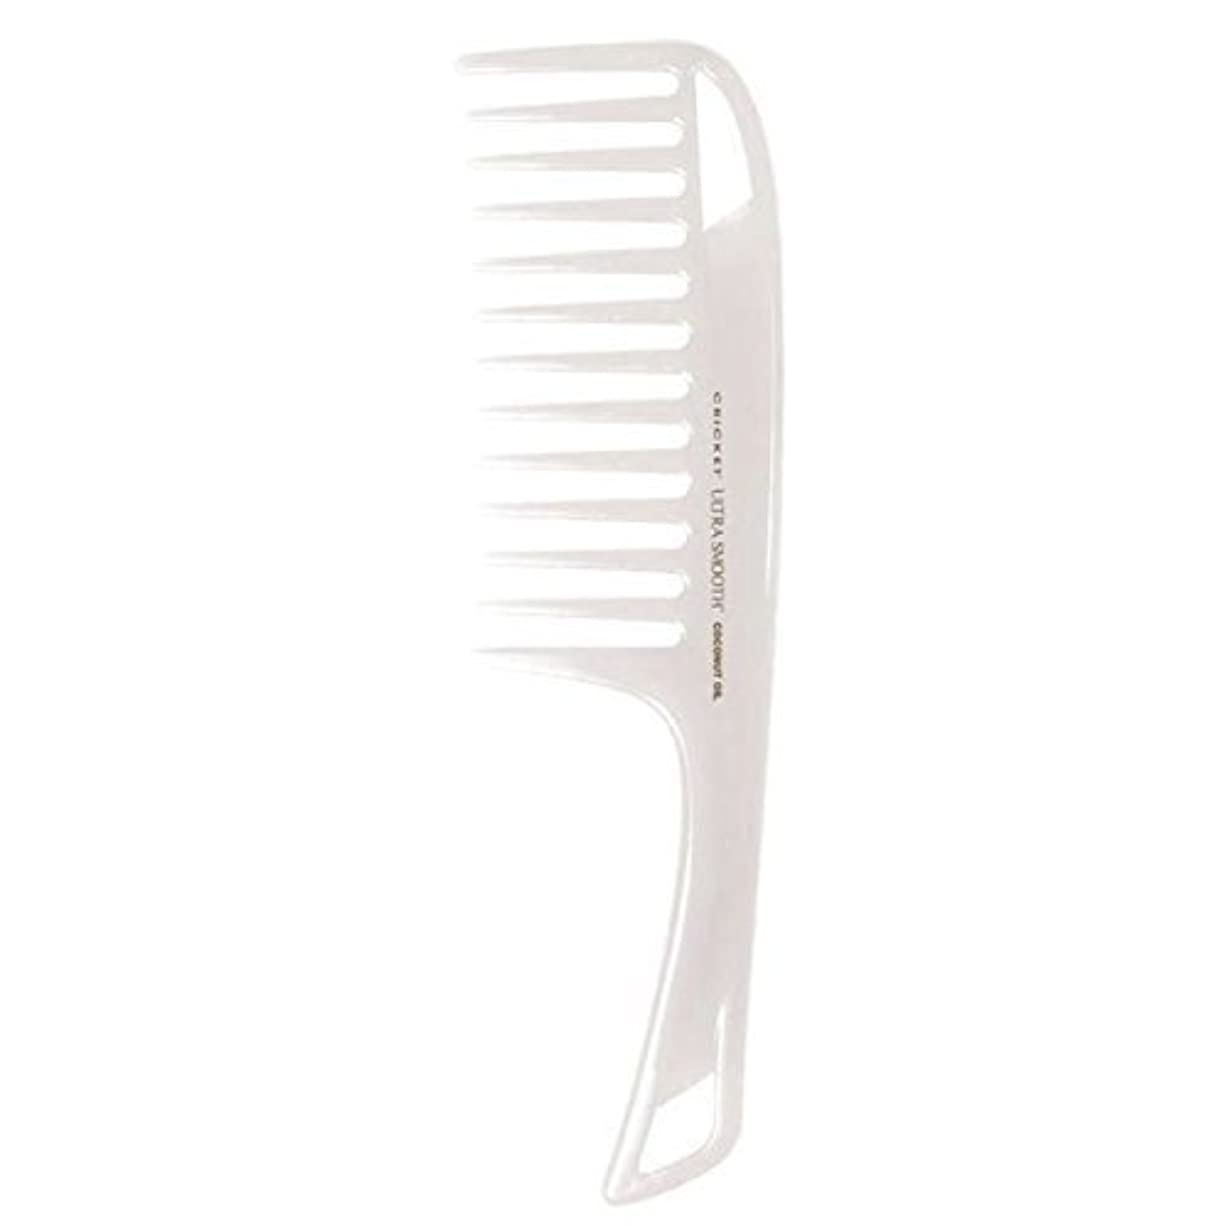 Cricket Ultra Smooth Coconut Detangler Comb [並行輸入品]